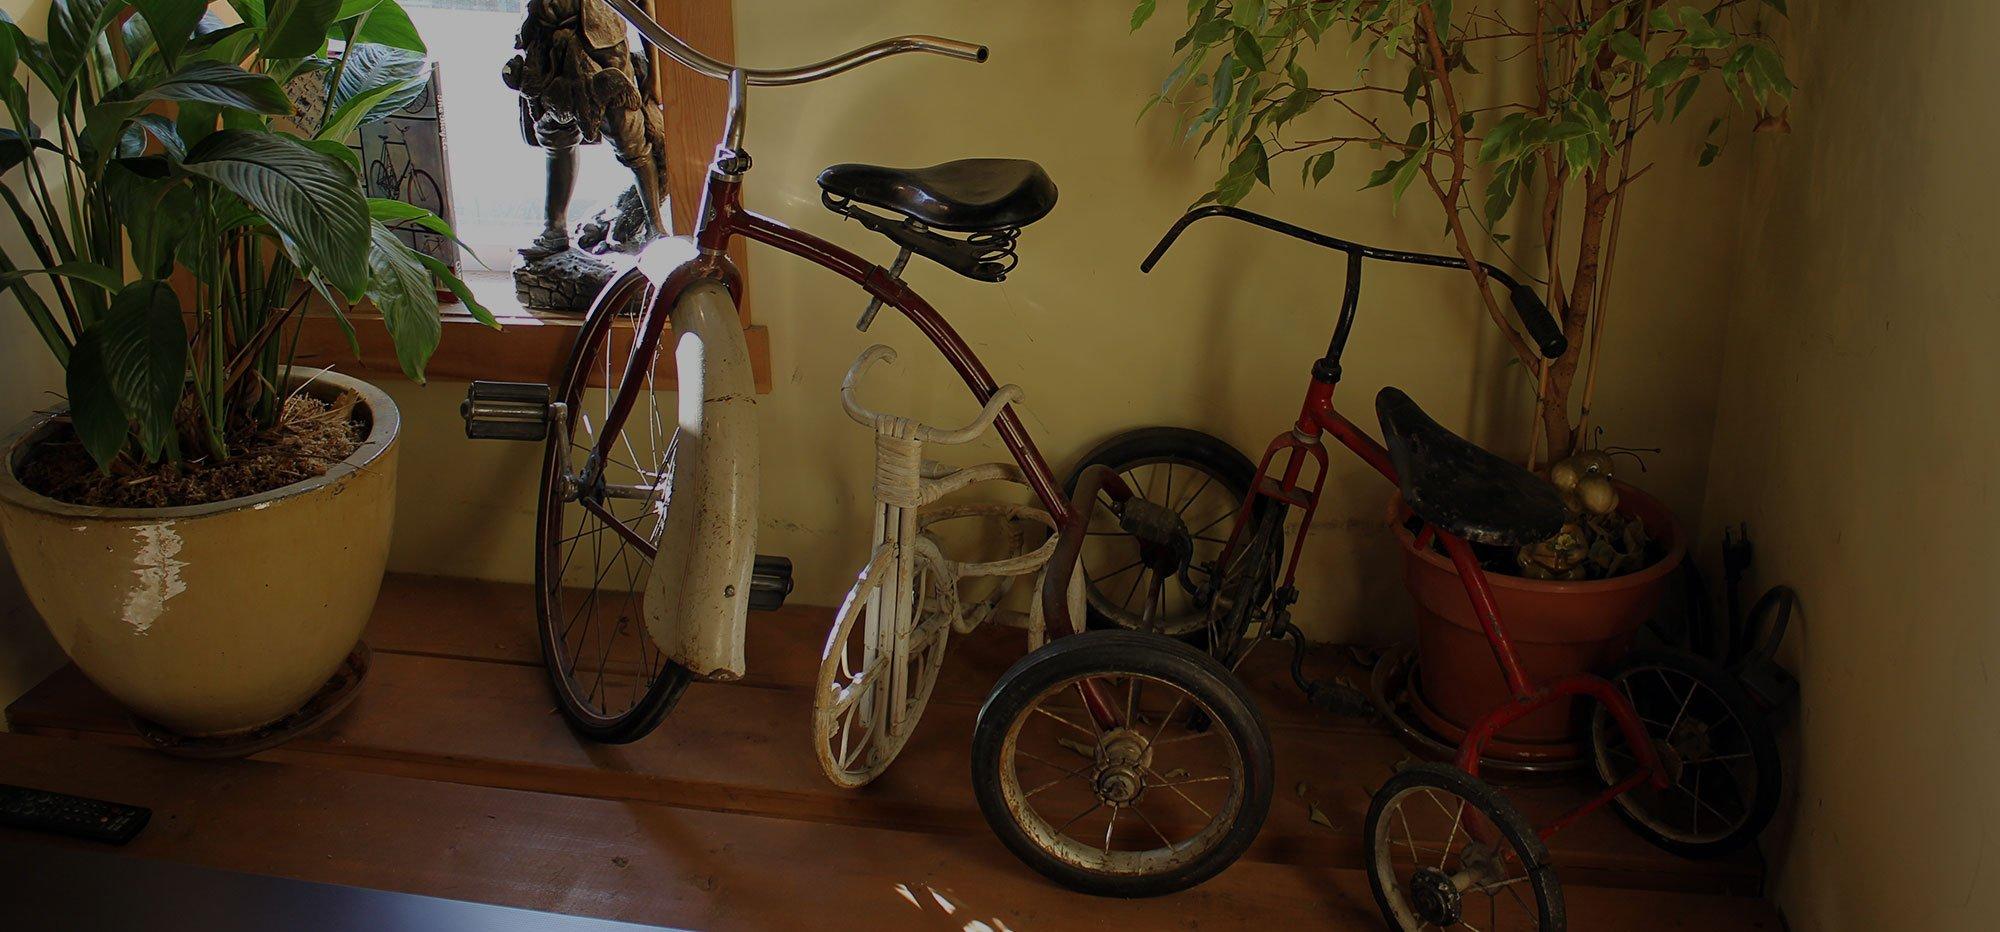 Antique children's tricycles